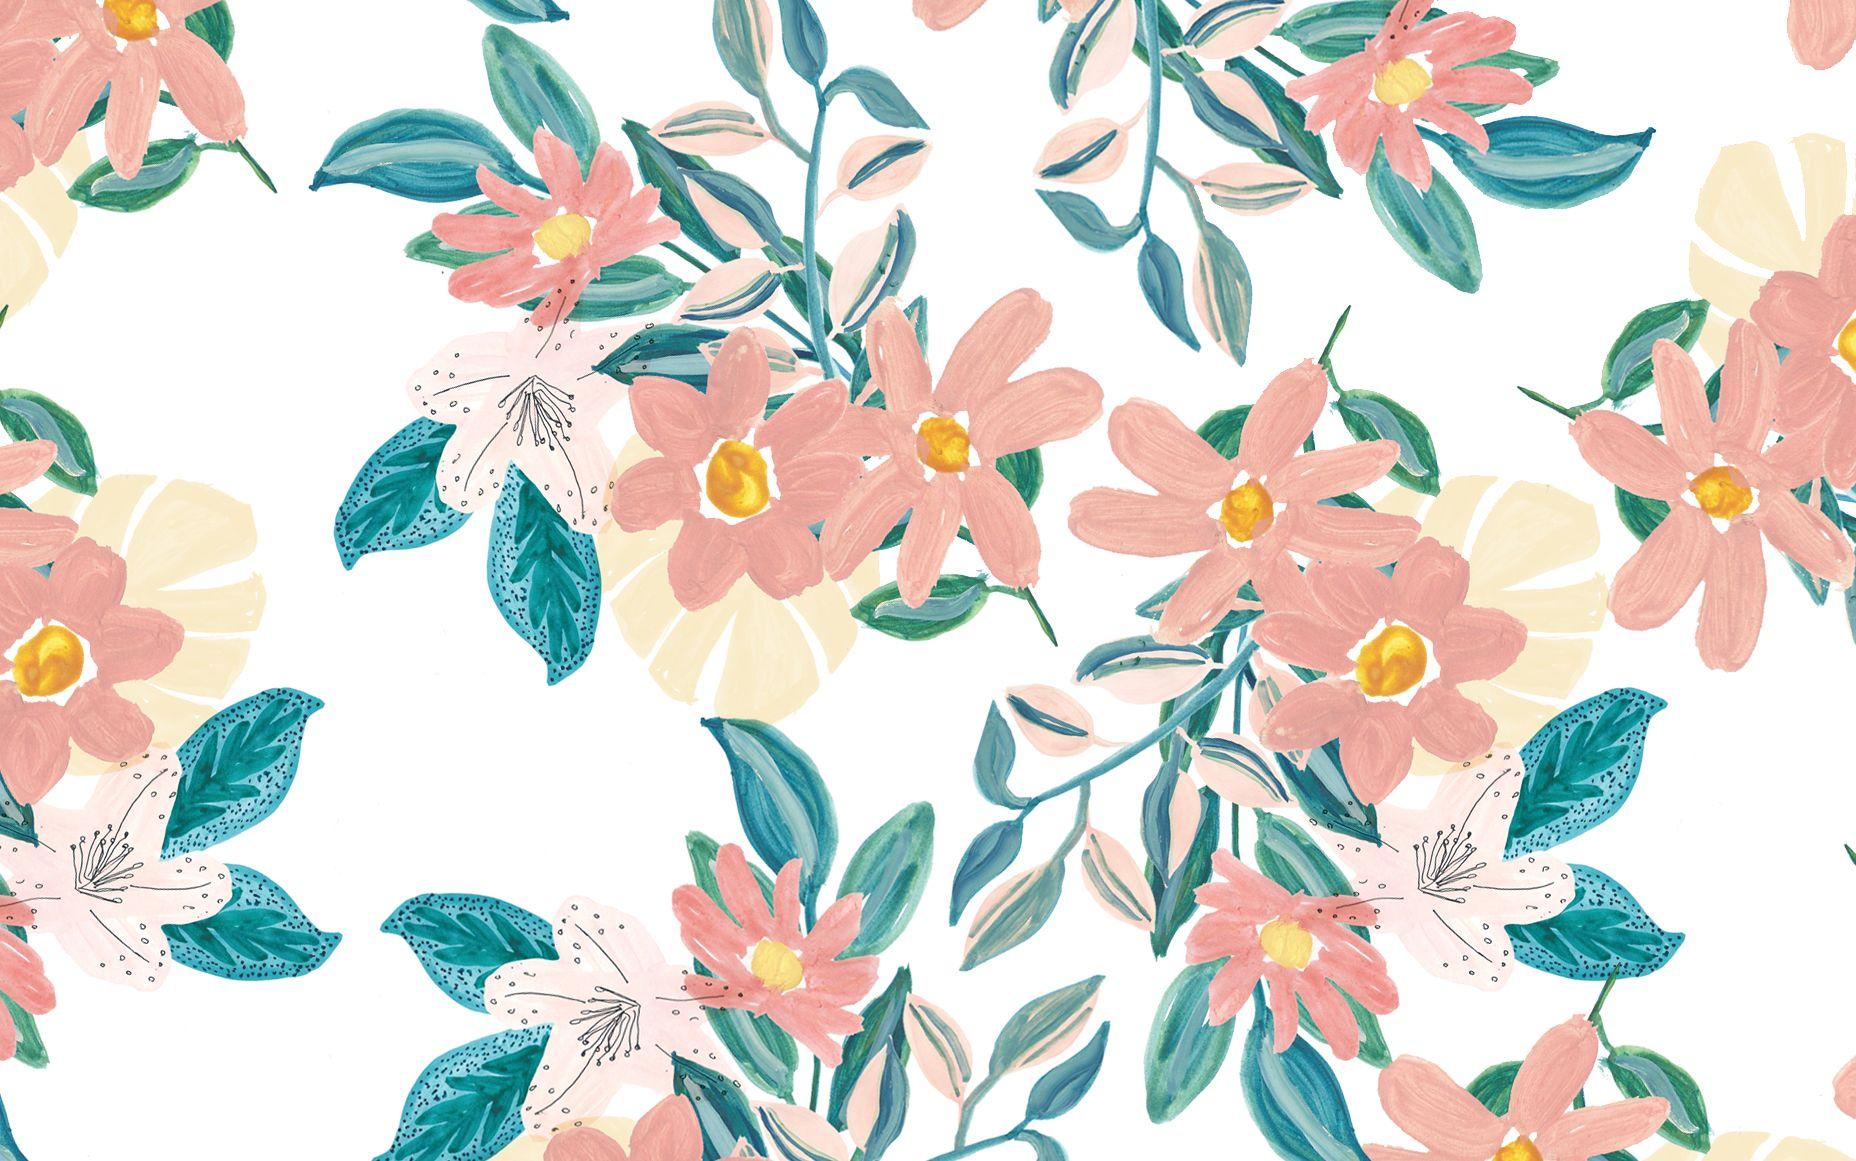 Spring Floral Desktop Wallpaper Designlovefest Fondo De Pantalla